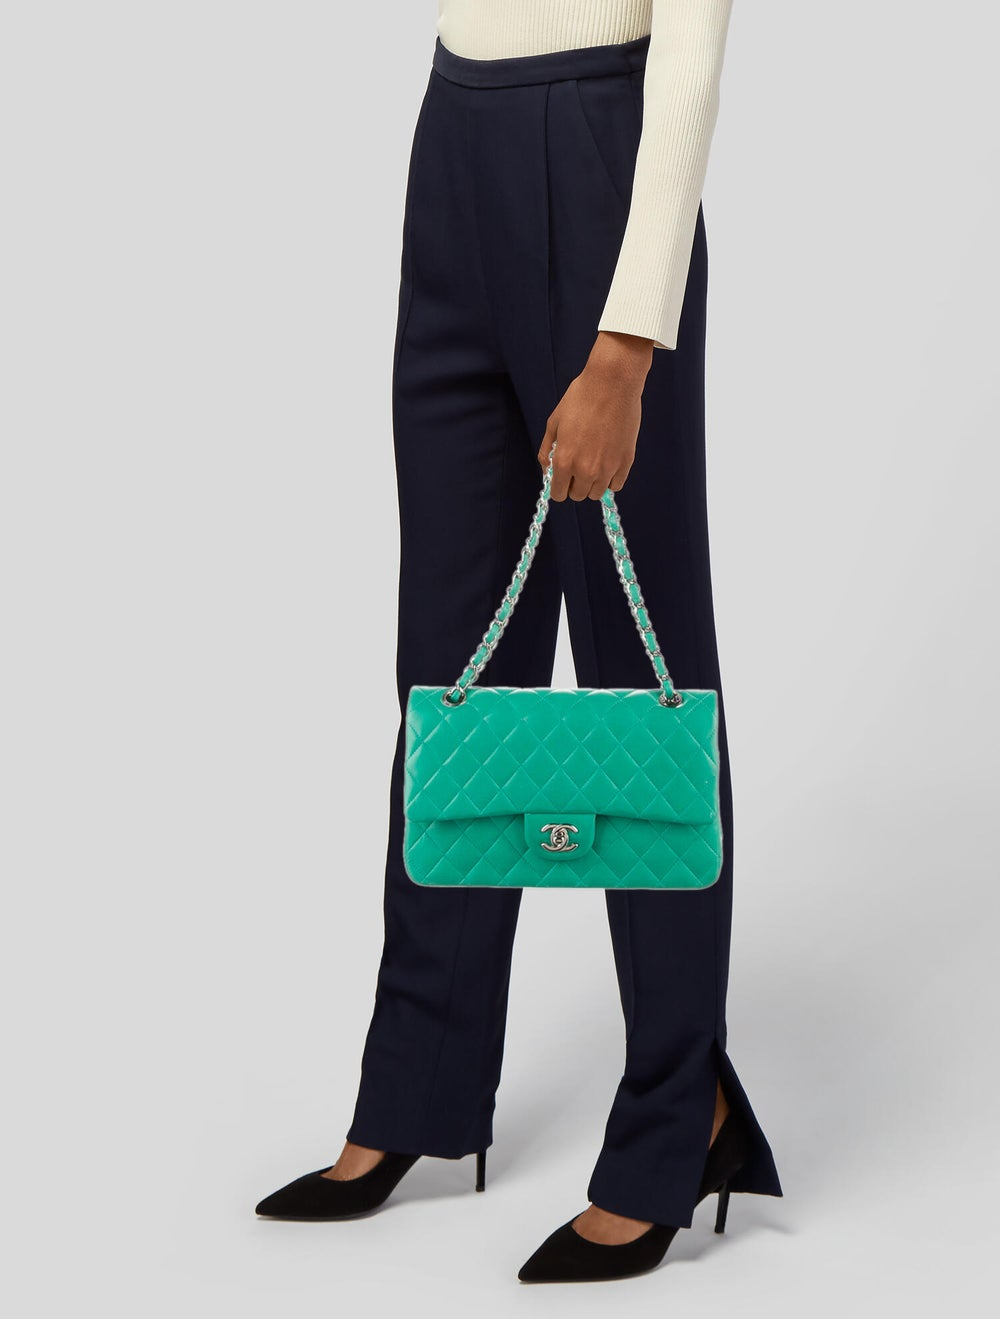 Chanel Classic Medium Double Flap Bag Blue - image 2